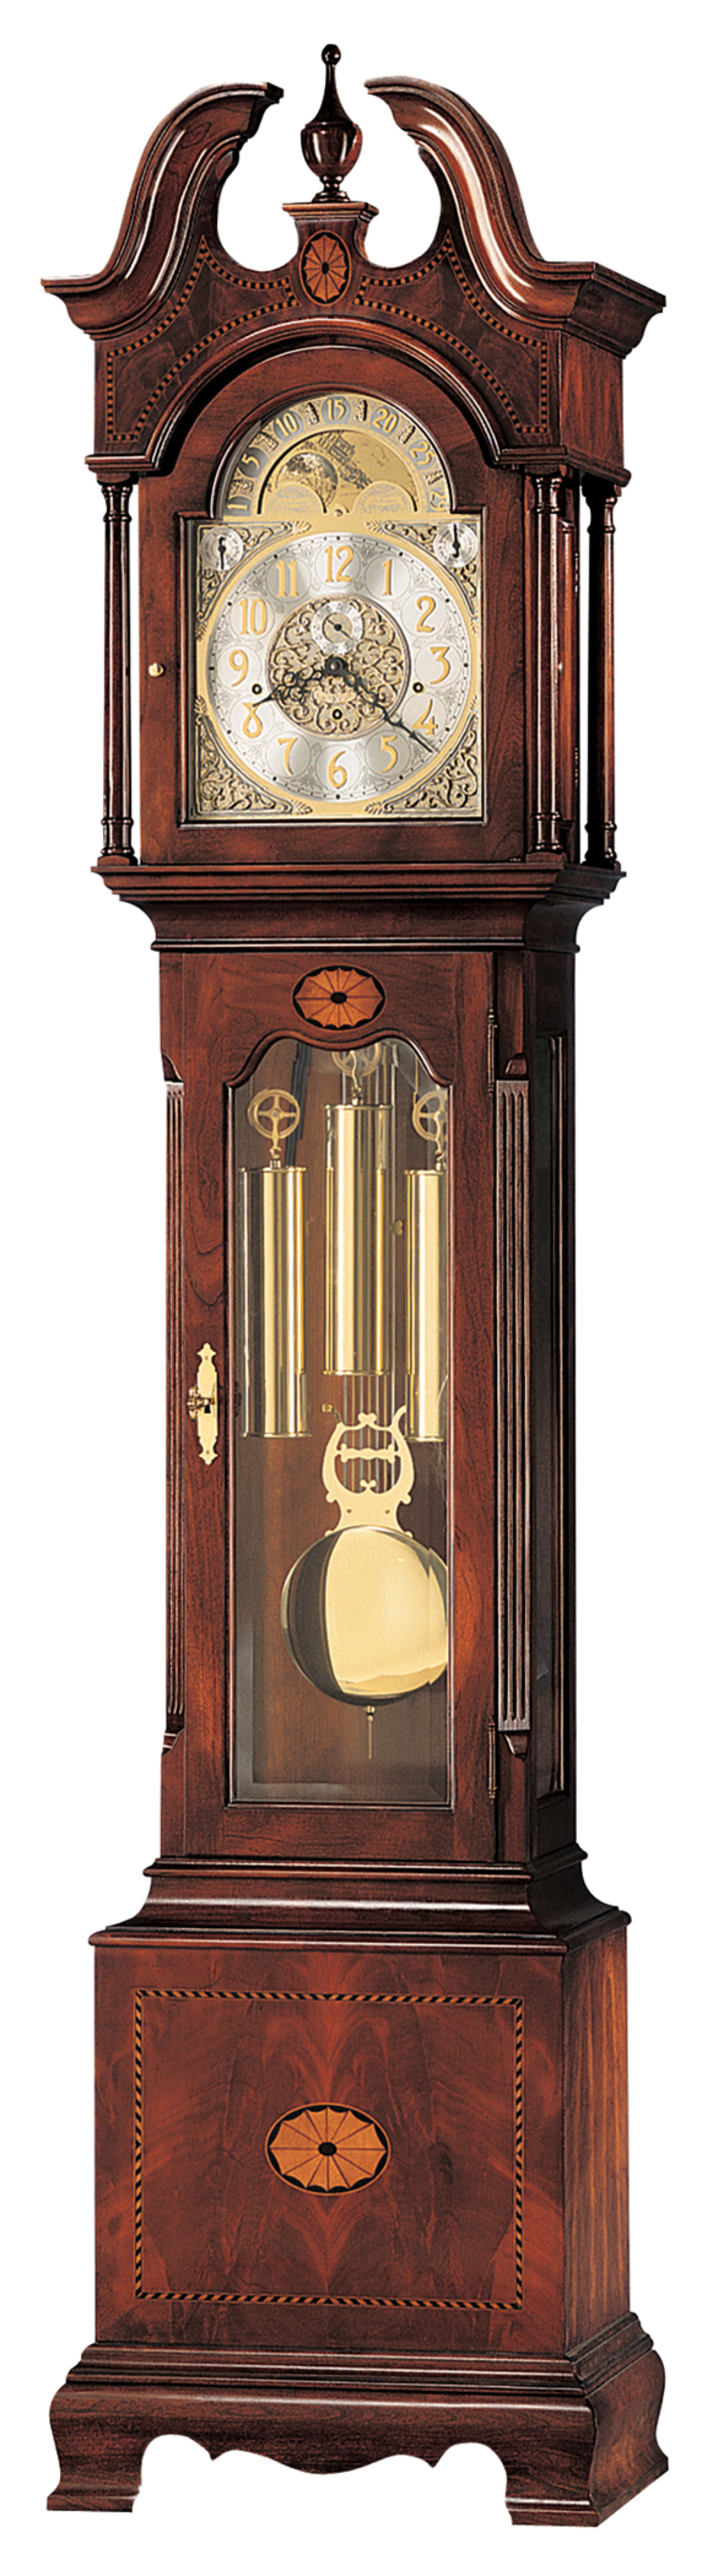 Howard-Miller-Presidential-Taylor-Floor-Clock-610-648